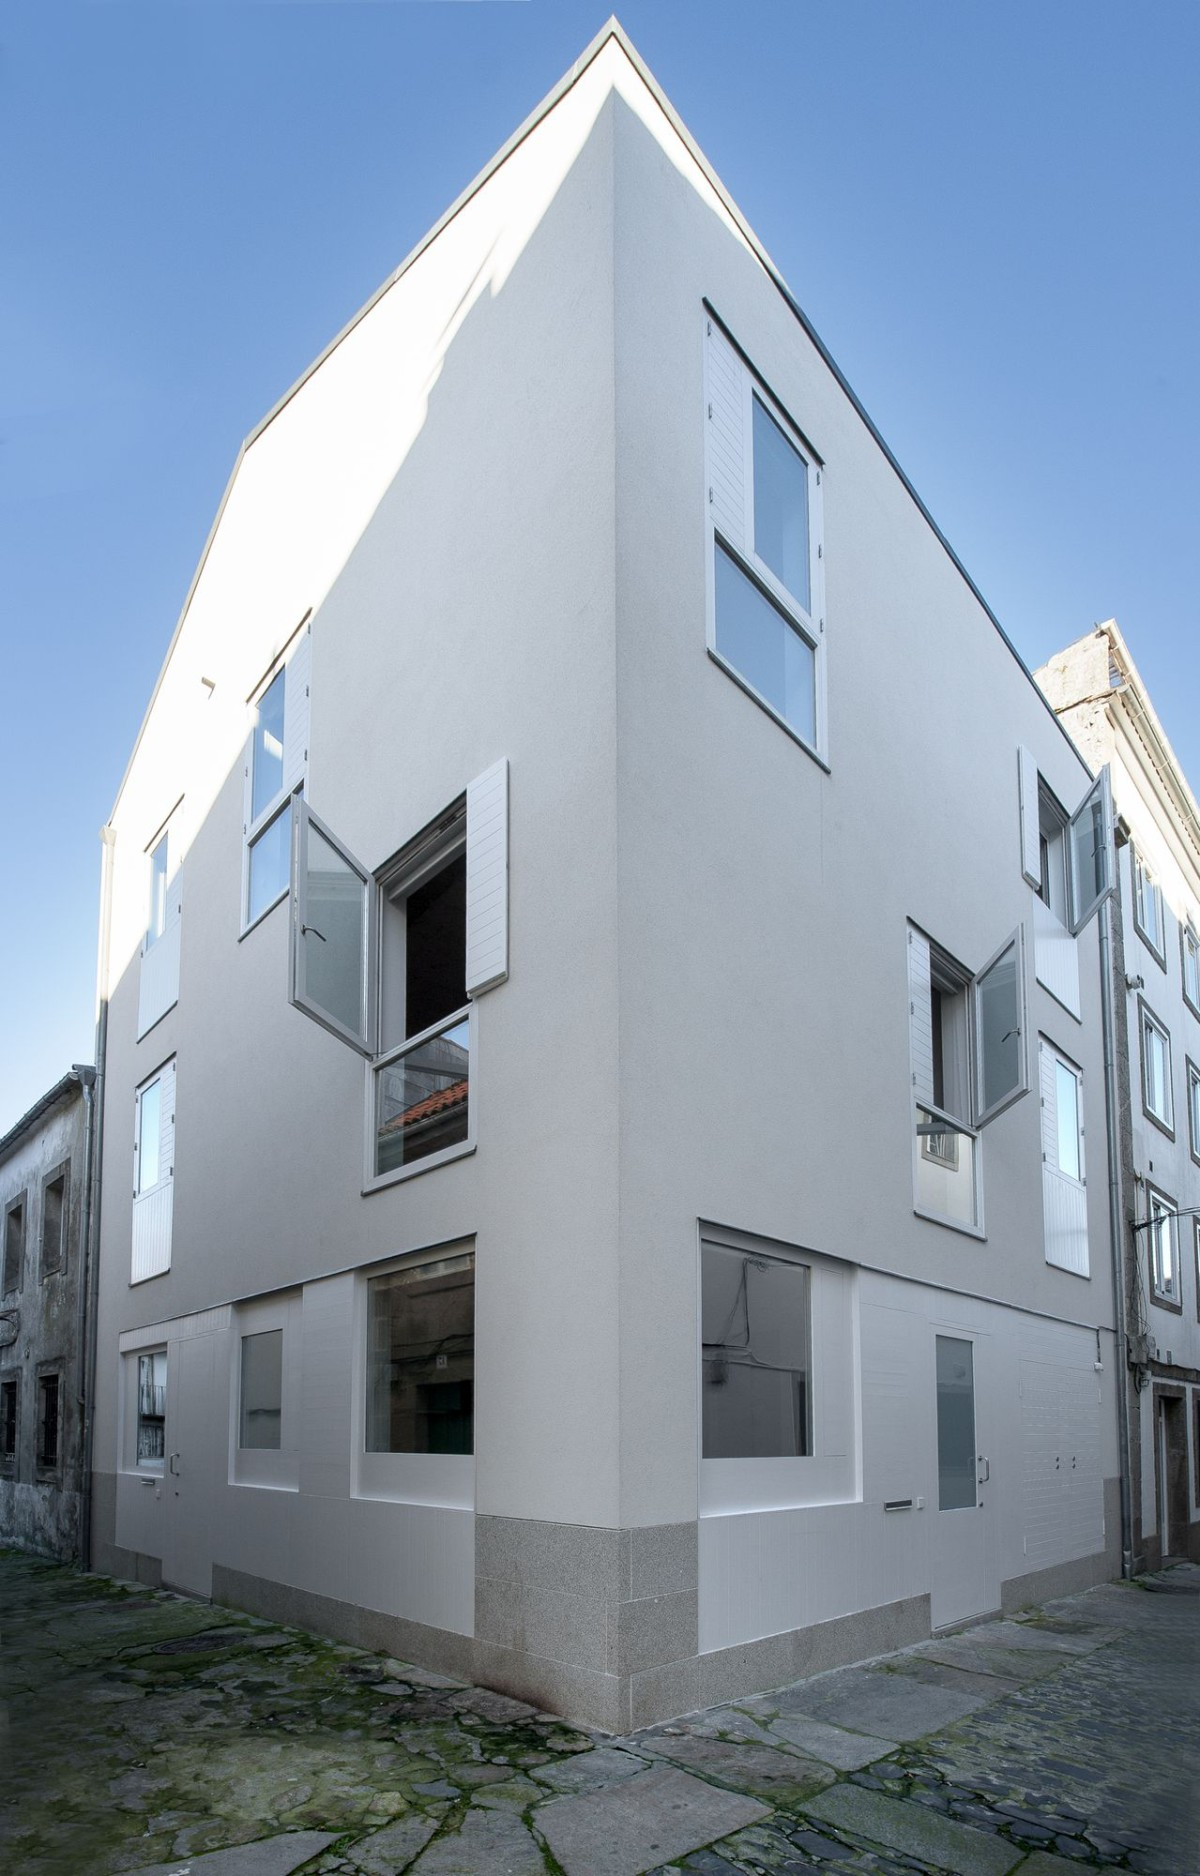 Rodríguez Blanco . Martínez Raído . Dos viviendas en Sta  Cristina . Santiago de Compostela afasia (2)